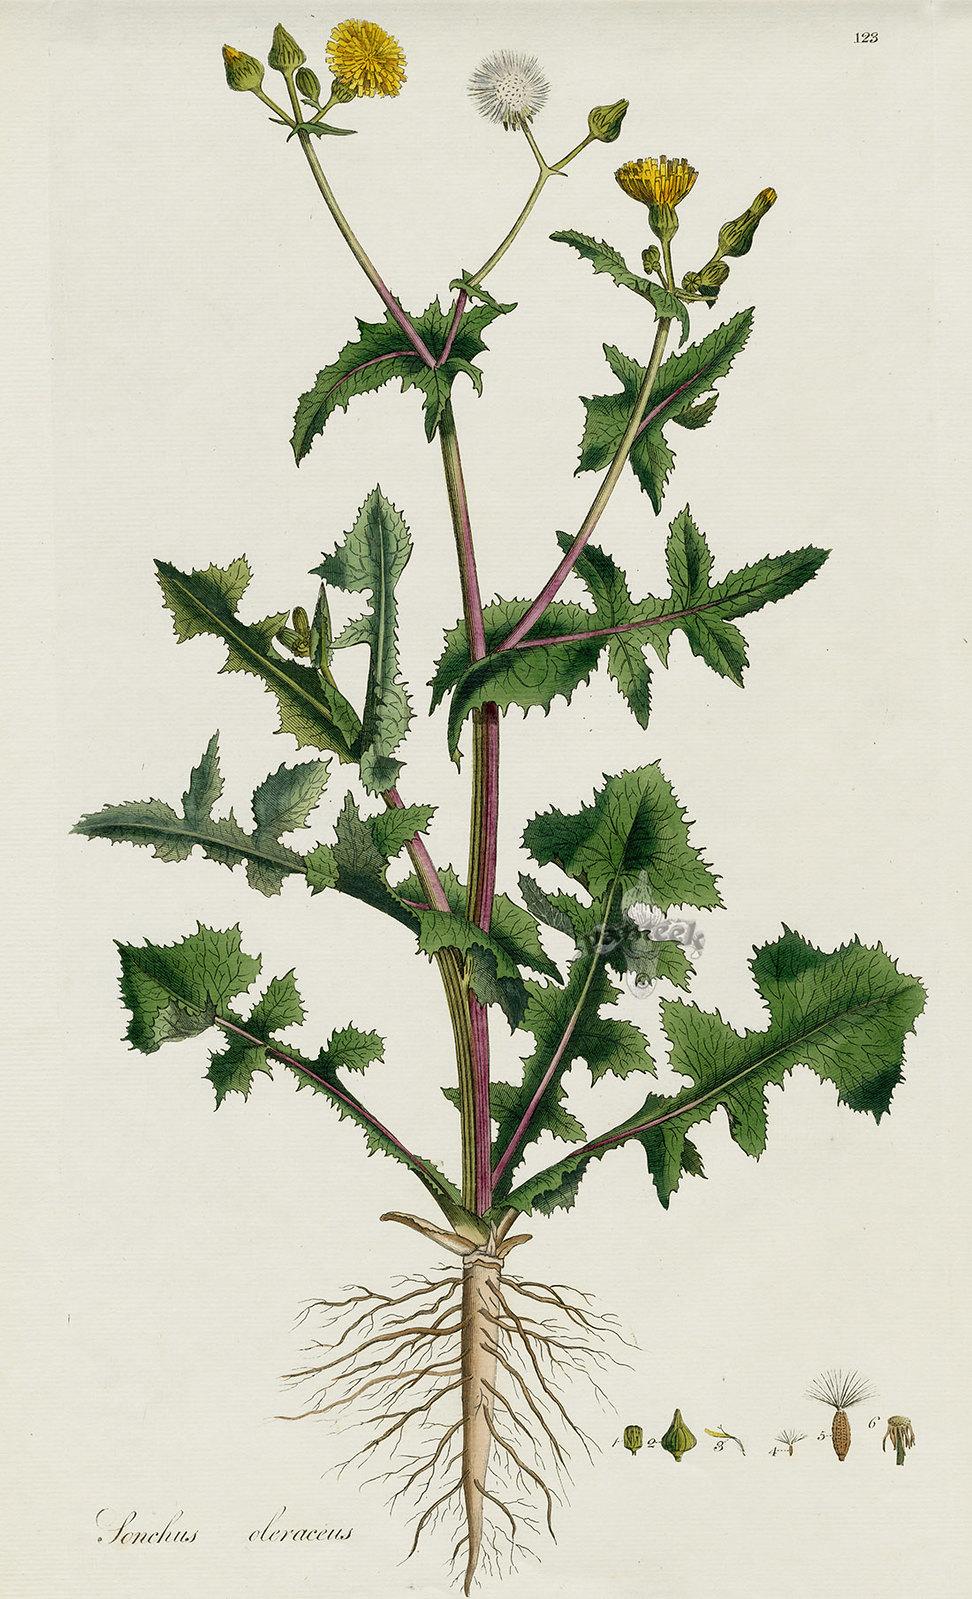 sow thistle (Sonchus oleracus)